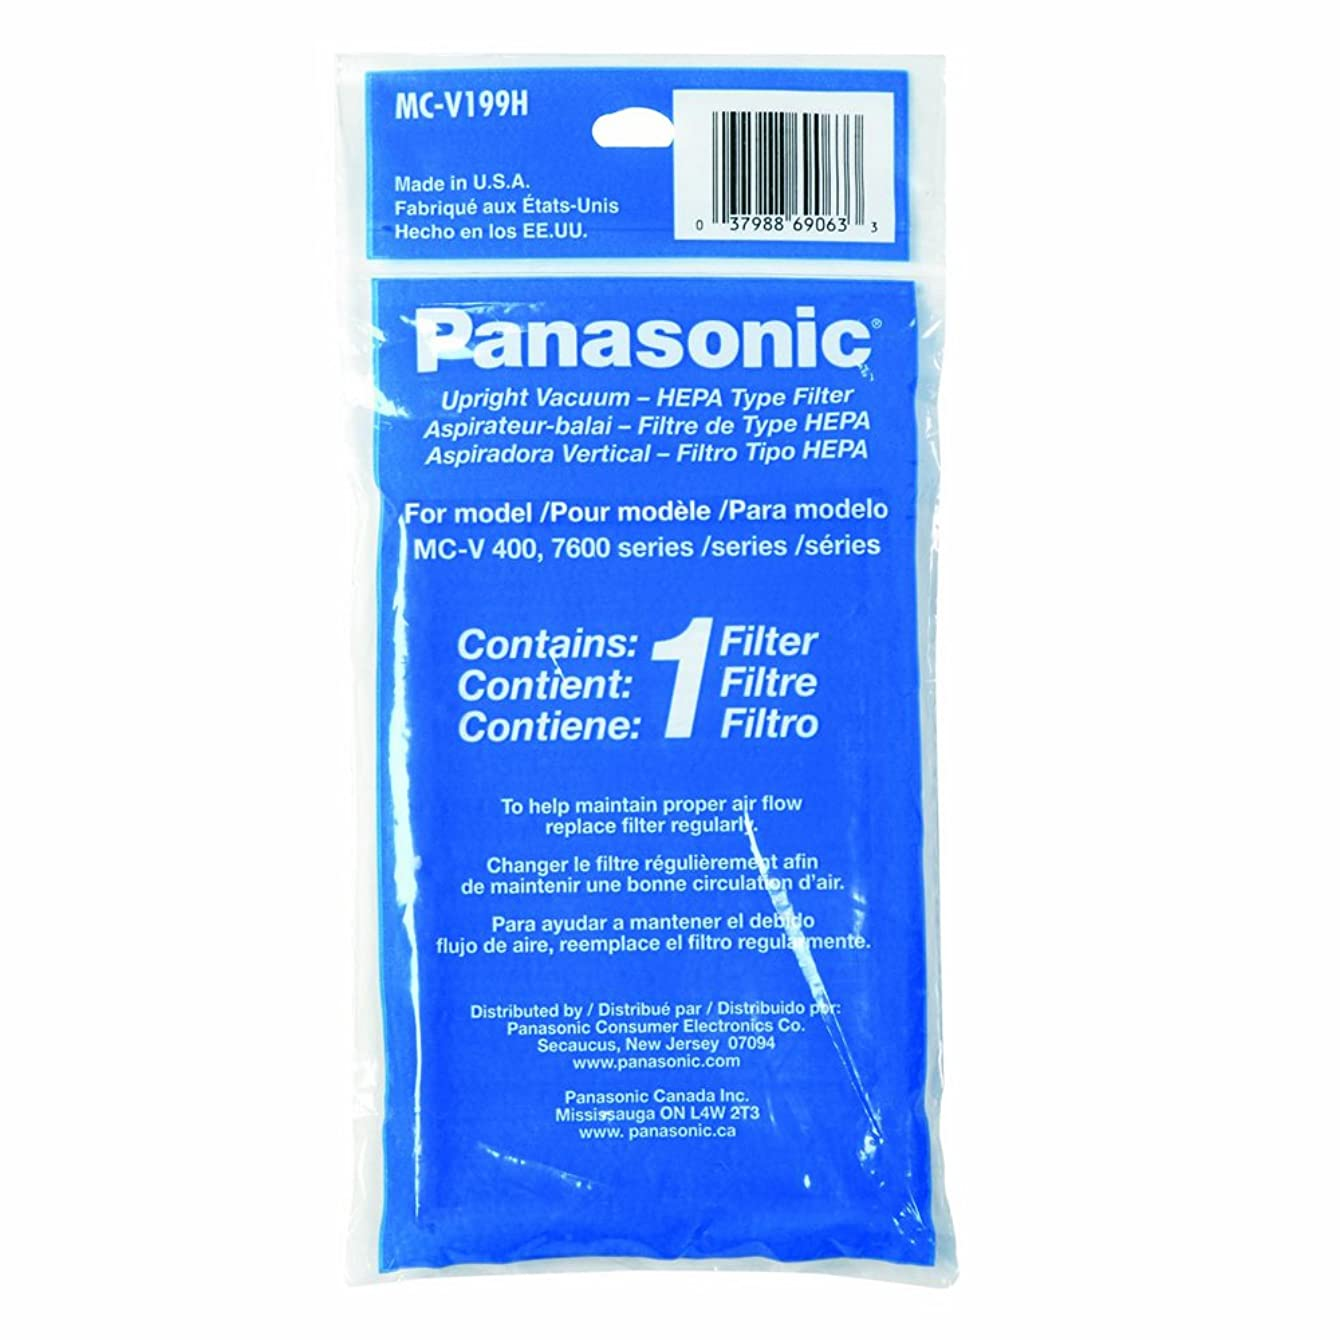 Panasonic MC-V199H HEPA Filter for MC-UL671 and MC-UL675 Upright Vacuum Cleaners